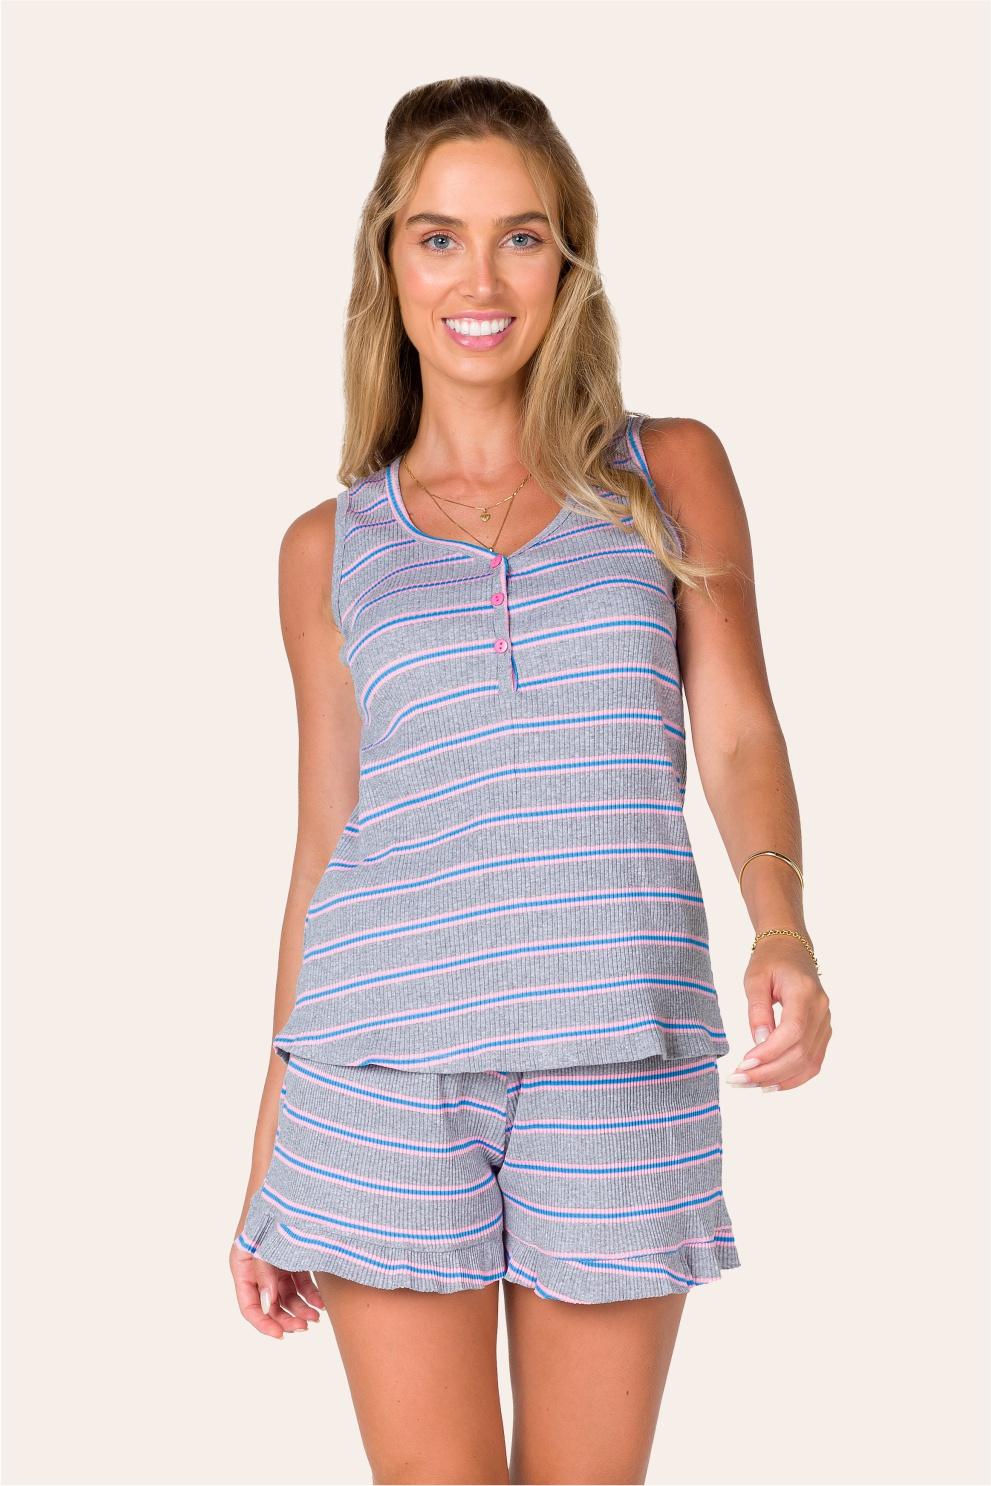 021/D - Pijama Adulto Ribana Canelada Listrada